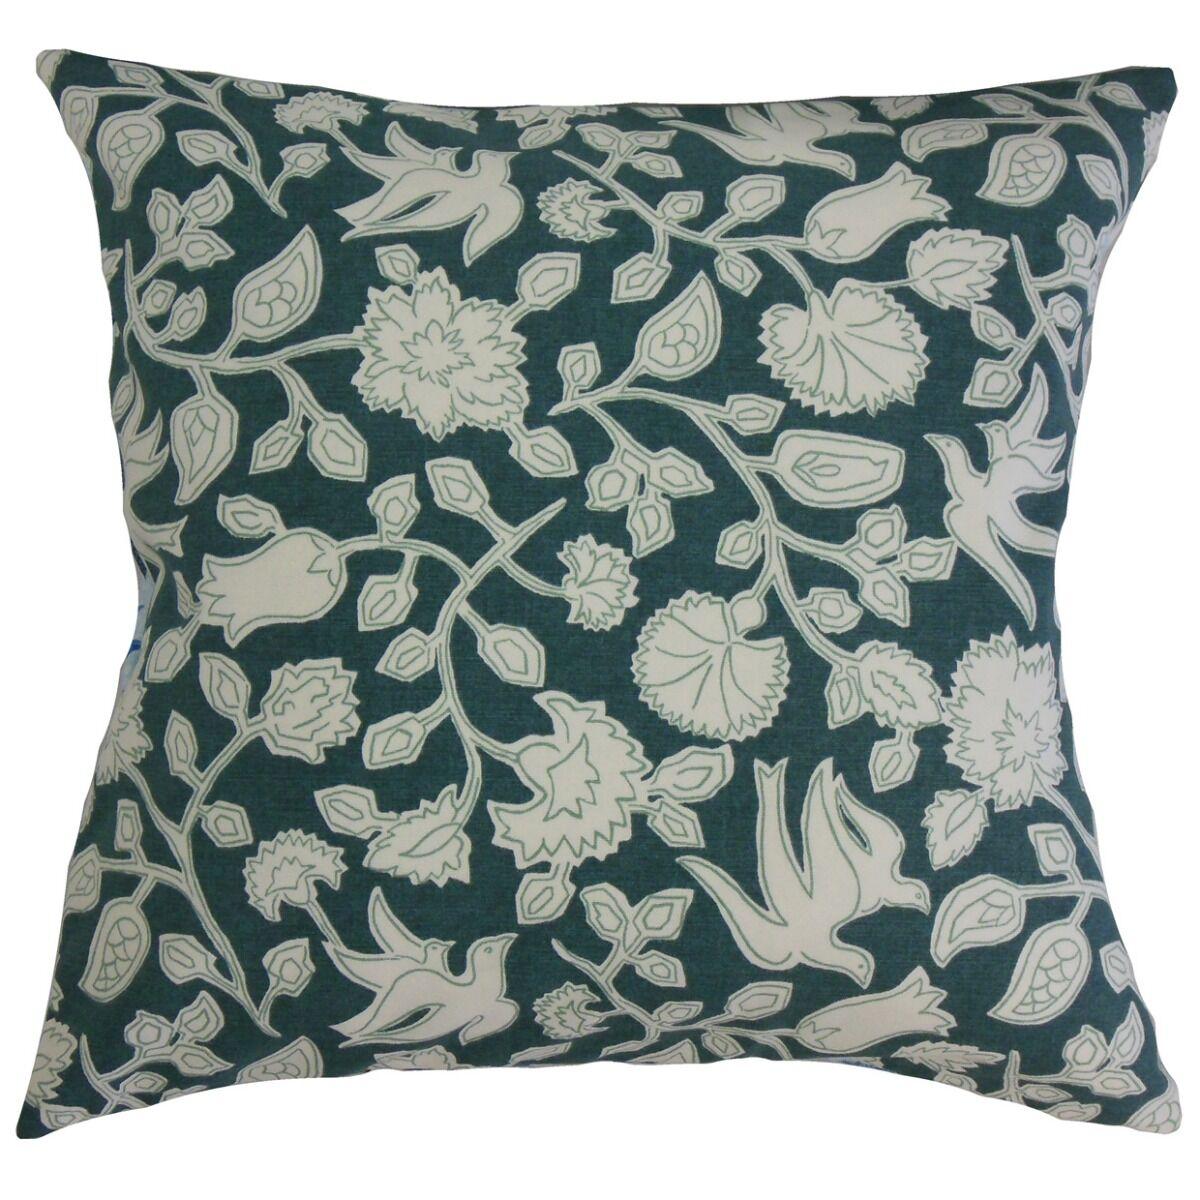 Makaila Floral Cotton Pillow Size: 18